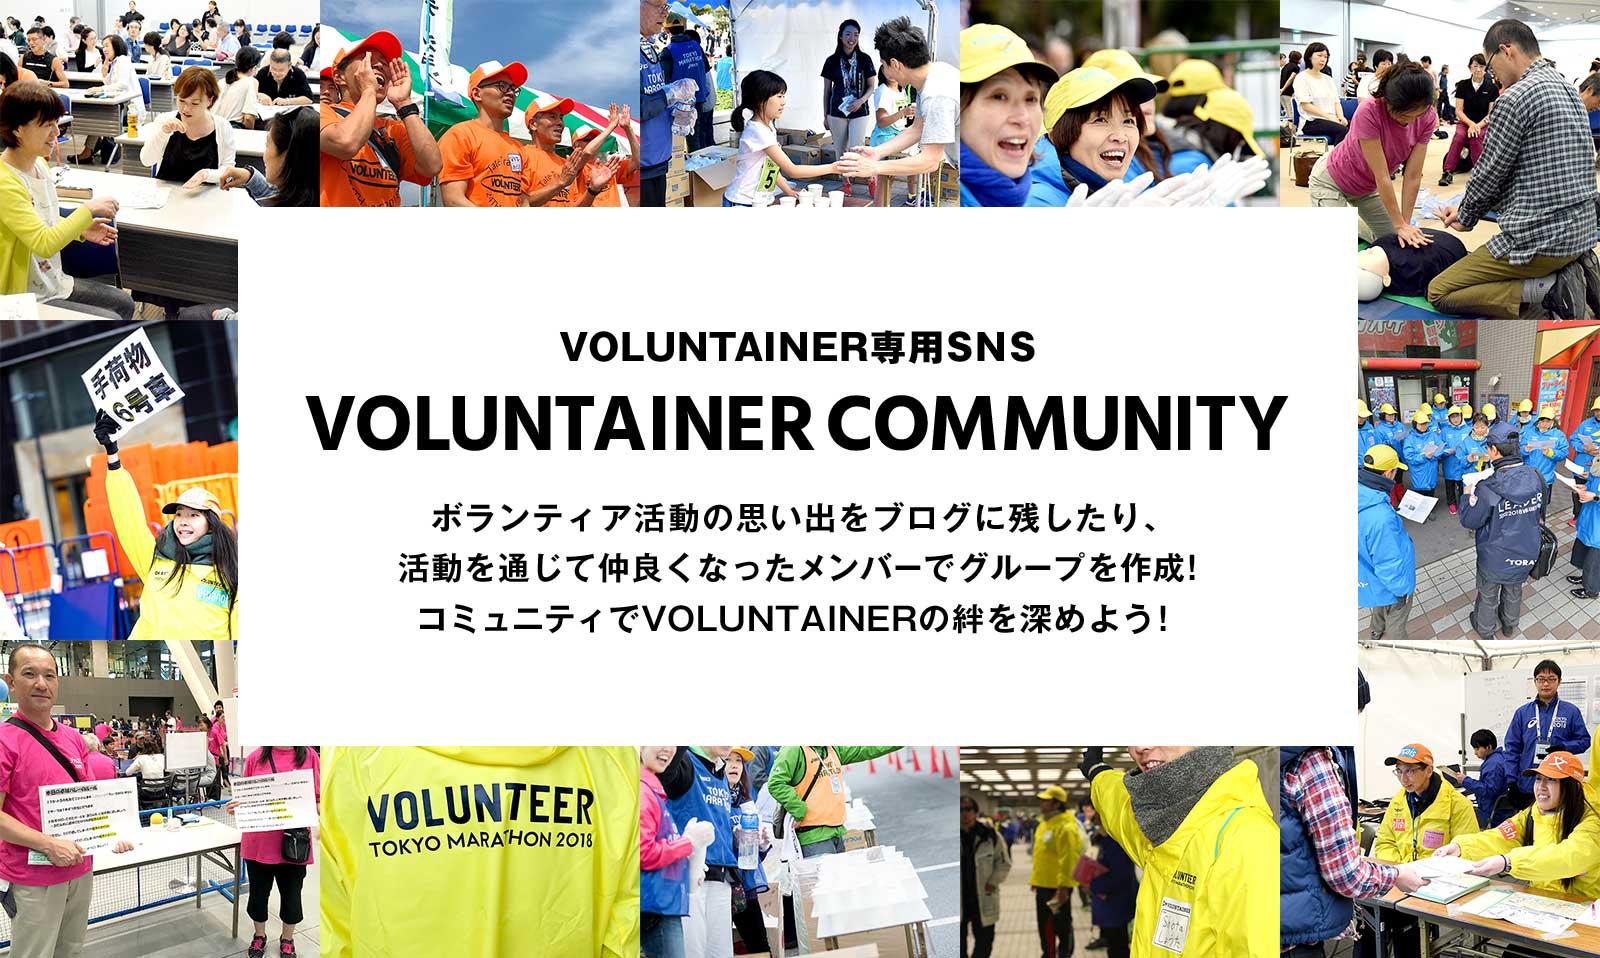 VOLUNTAINER COMMUNITY START!!